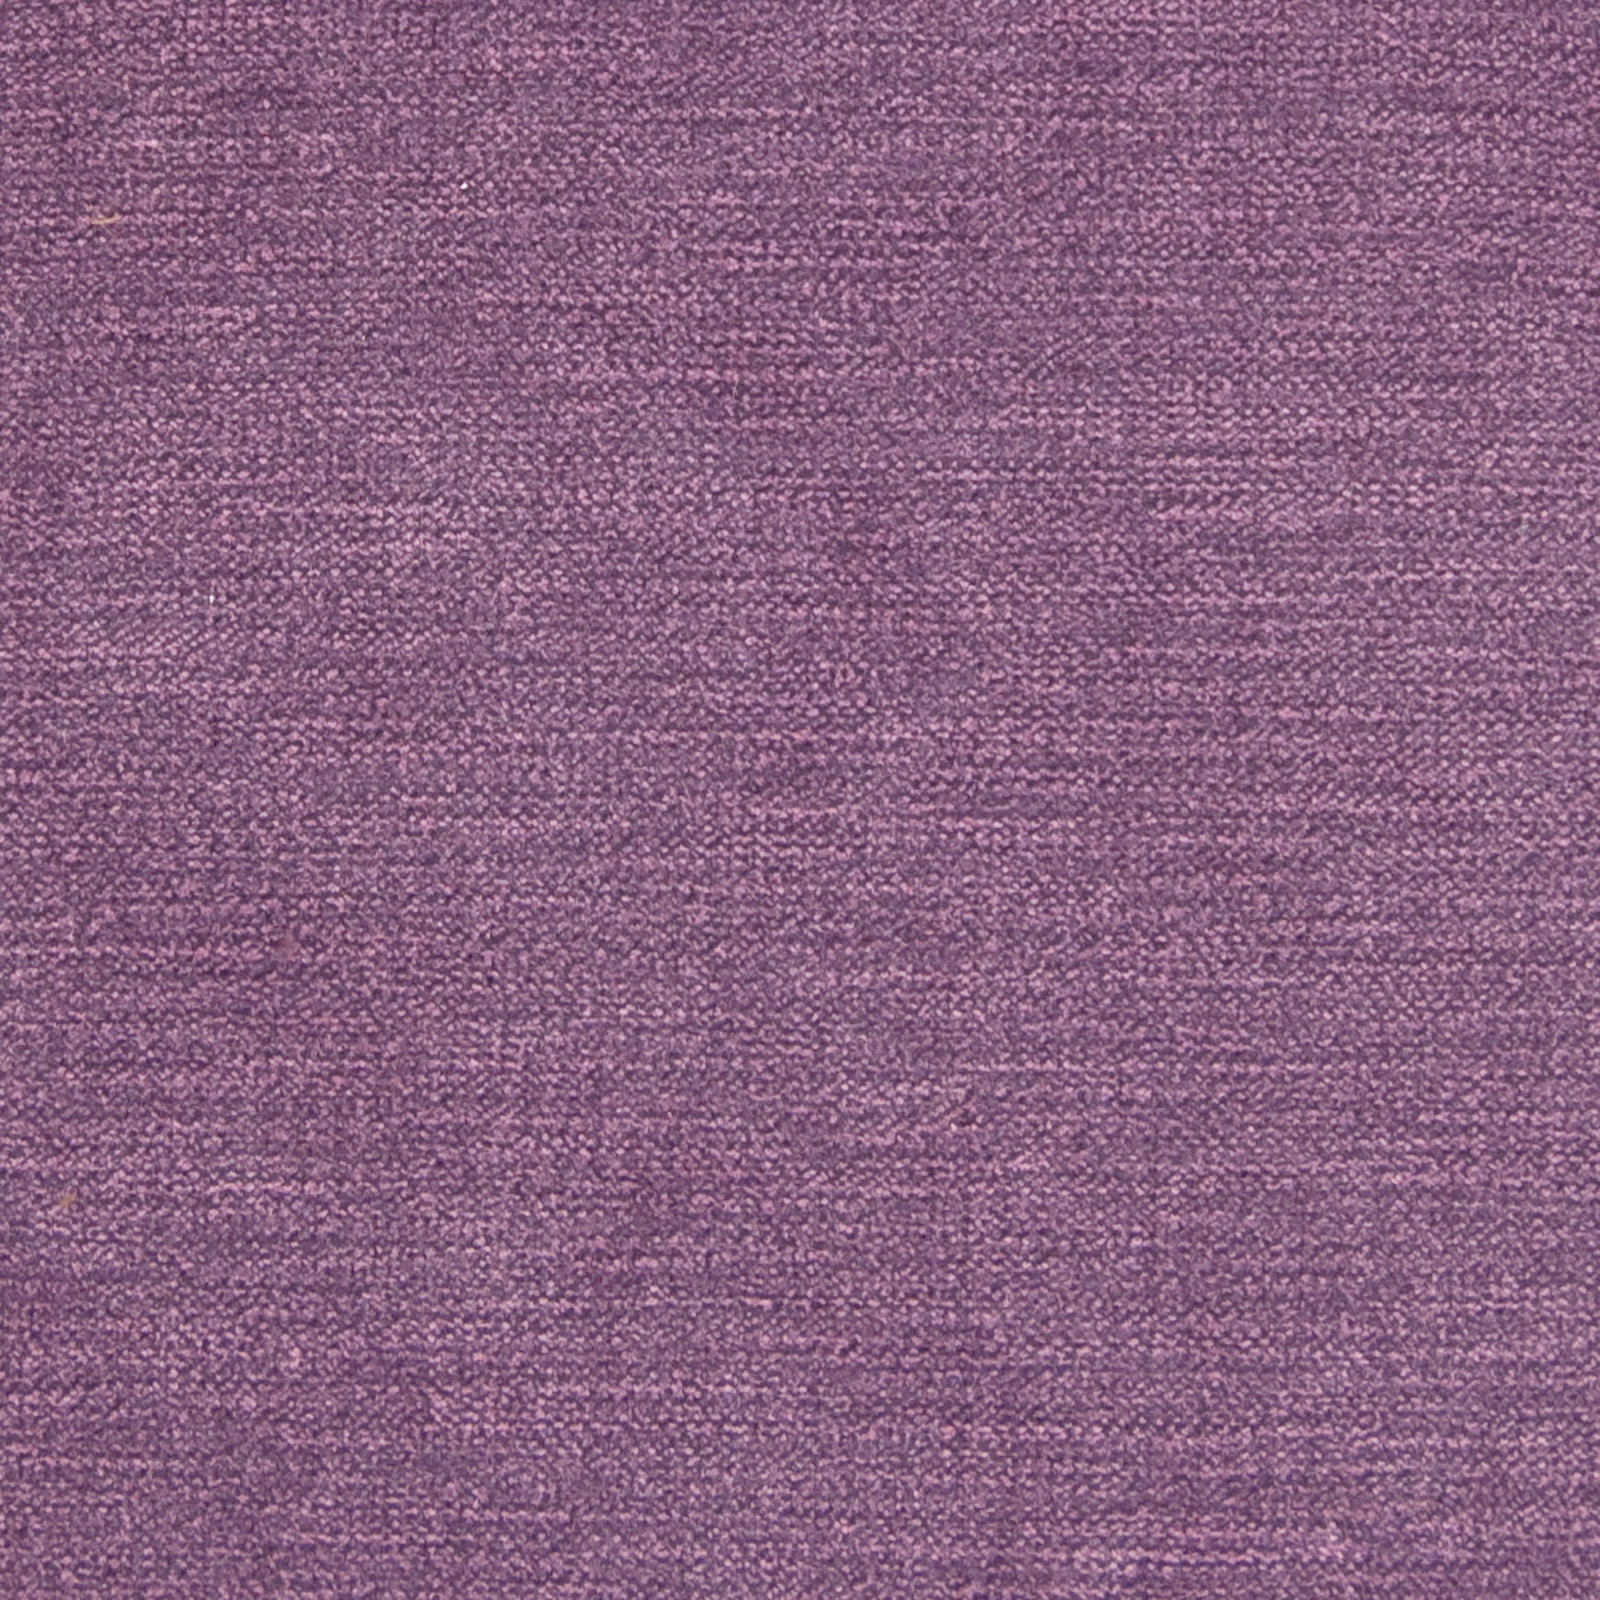 B1250 Aubergine Greenhouse Fabrics